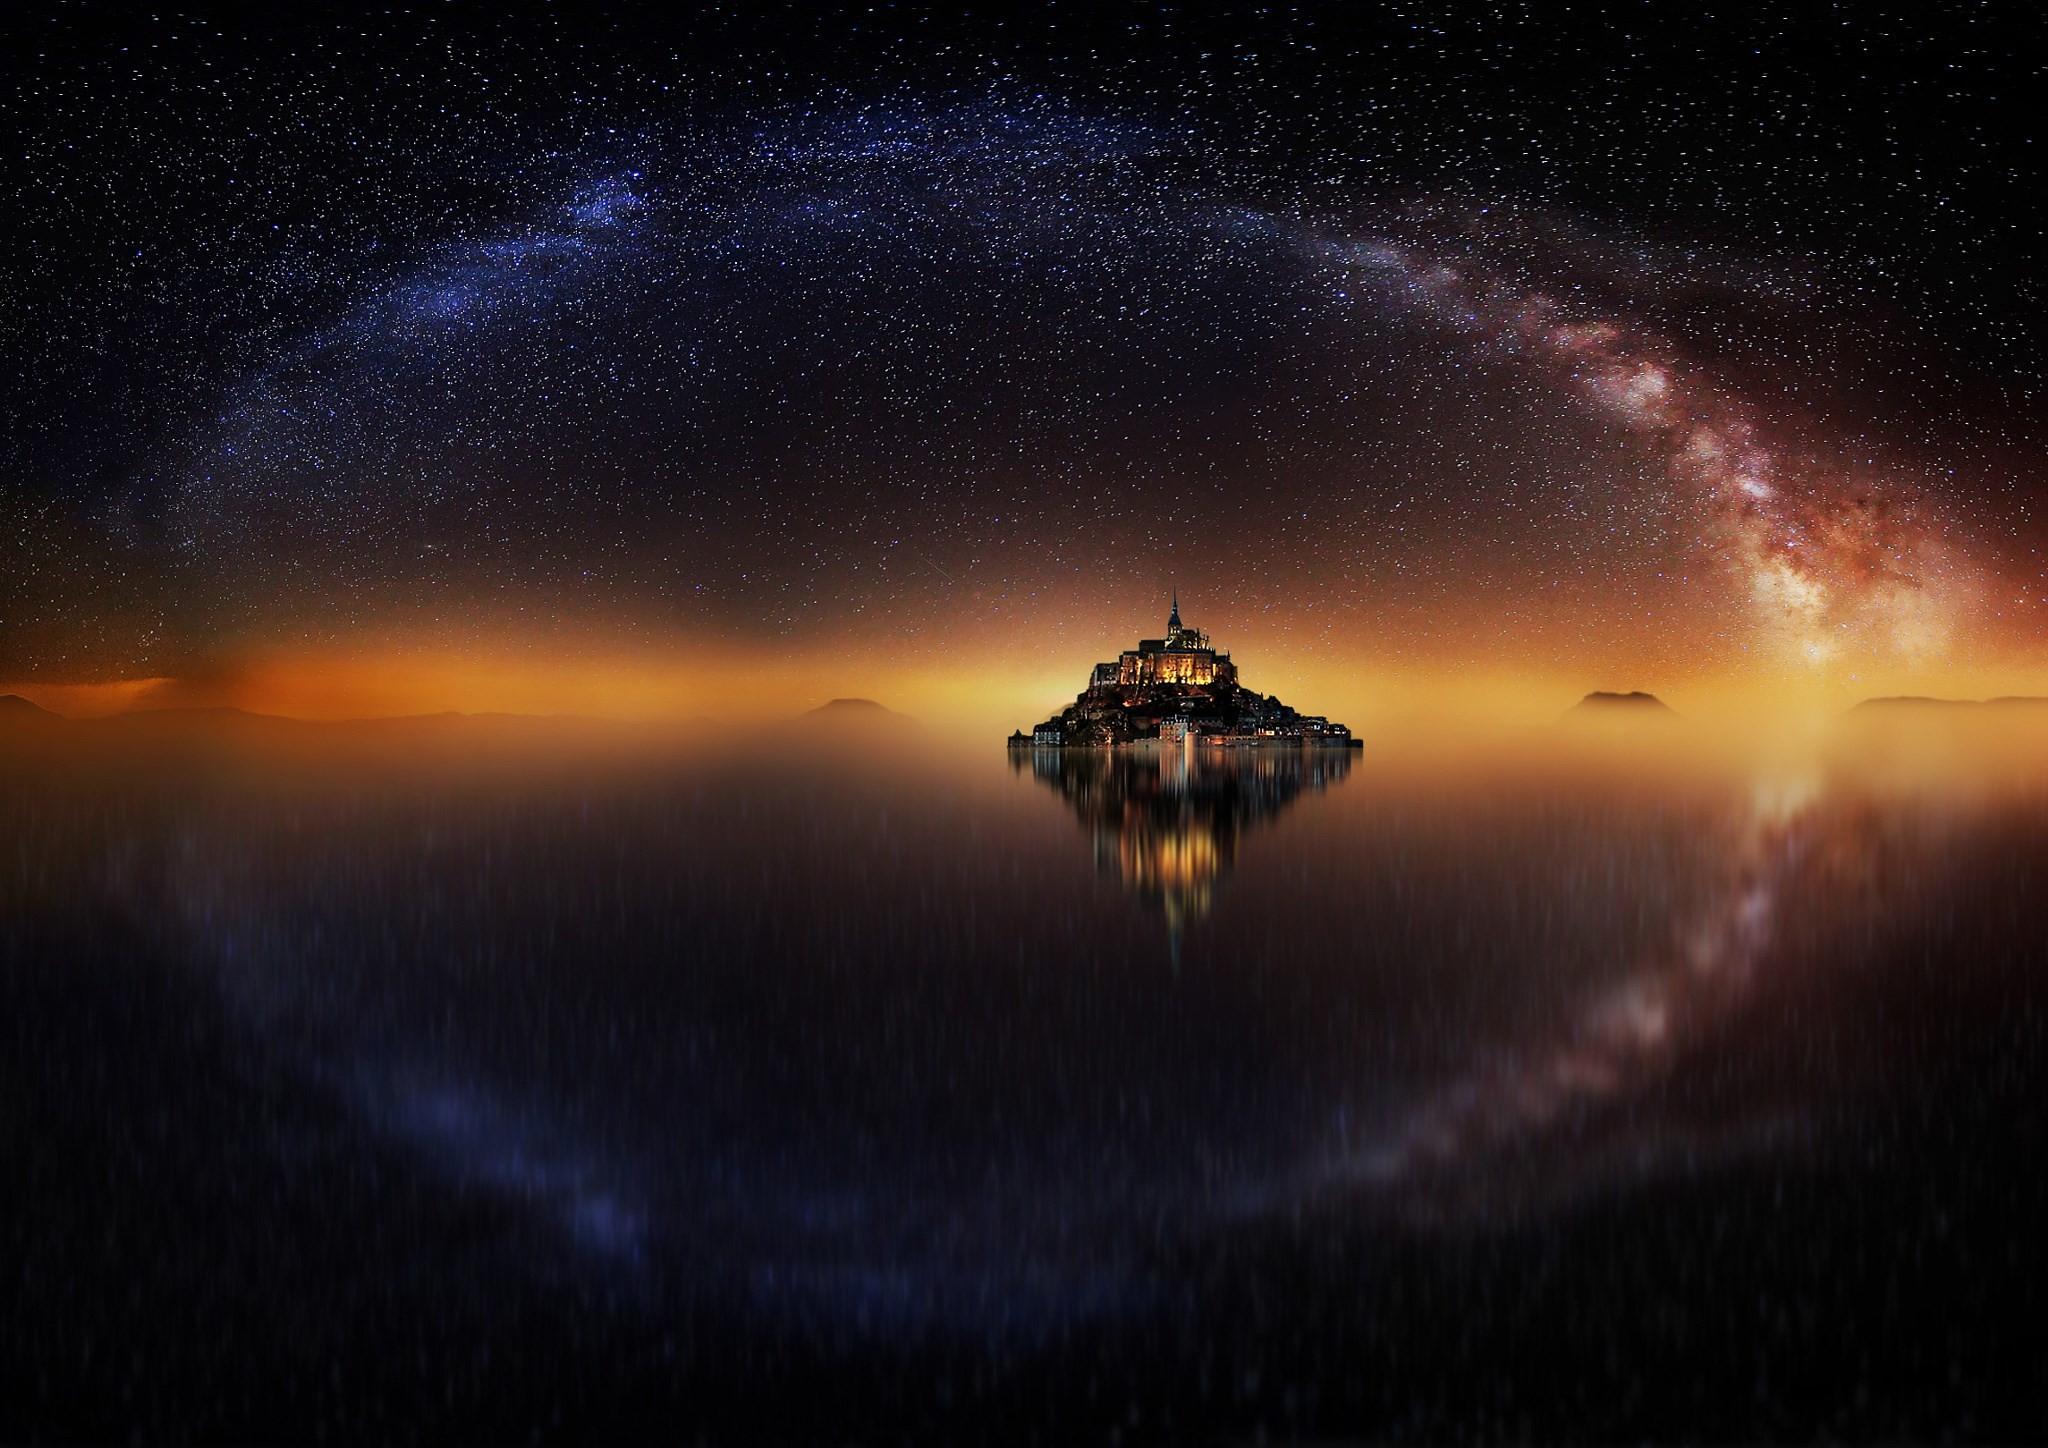 Samsung Galaxy S5 Wallpaper: Milky Way Wallpaper (77+ Images